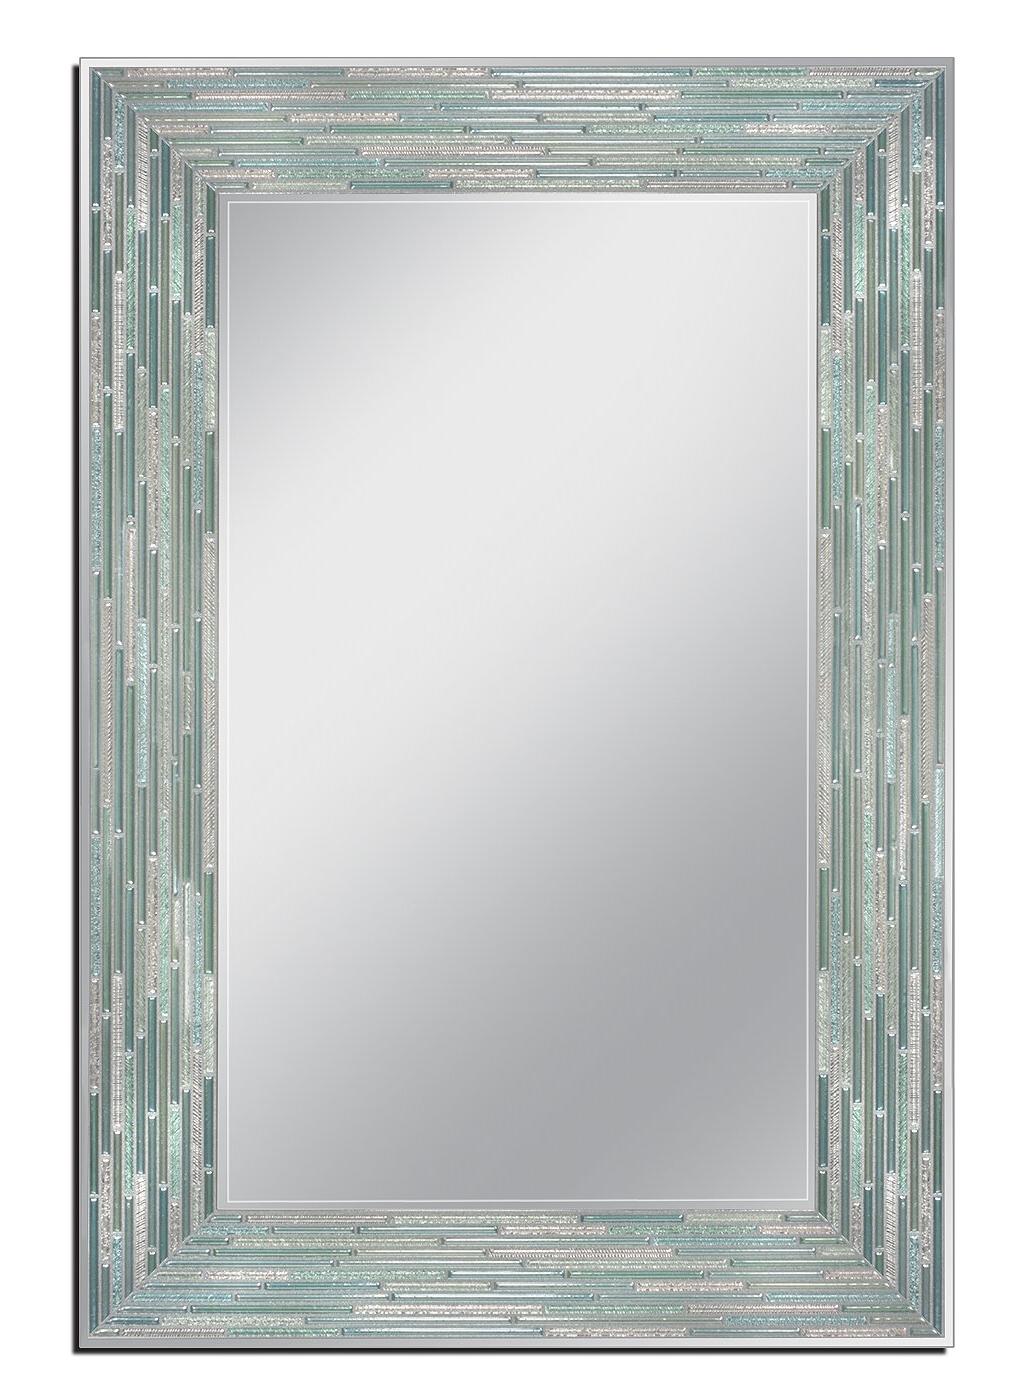 Macgregor Sea Glass Rustic Venetian Wall Mirror In Recent Venetian Wall Mirrors (View 10 of 20)